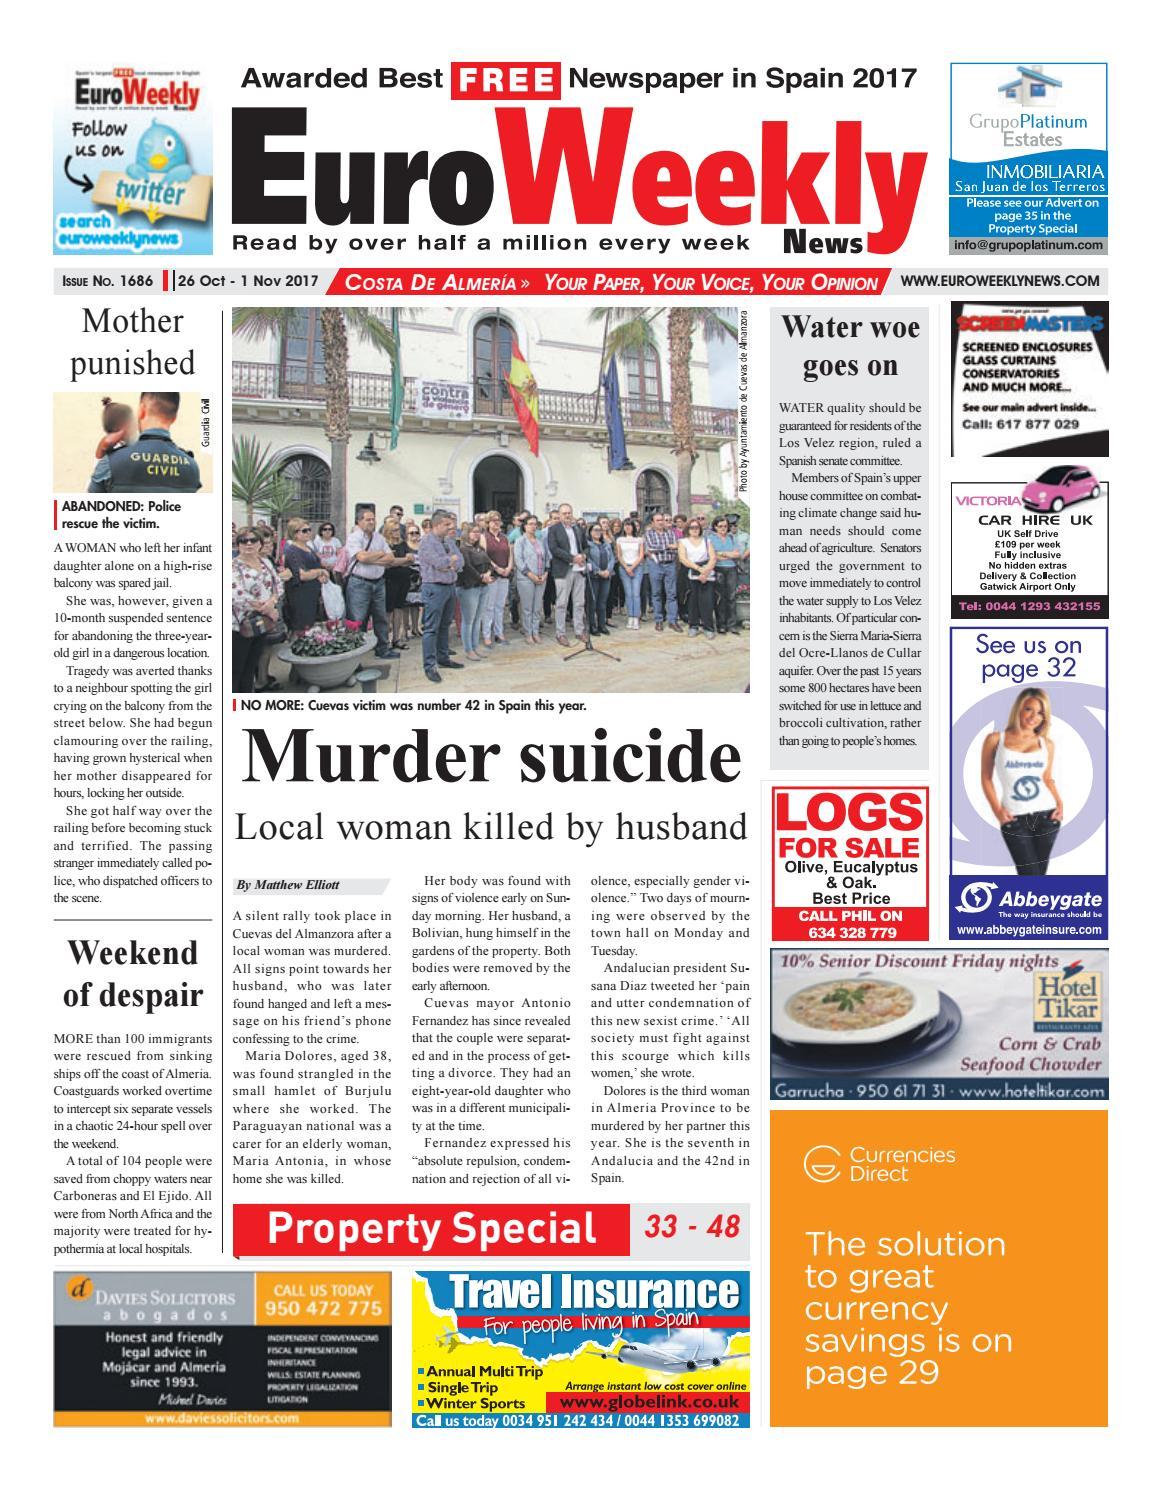 Euro Weekly News Costa De Almeria 26 October 1 November